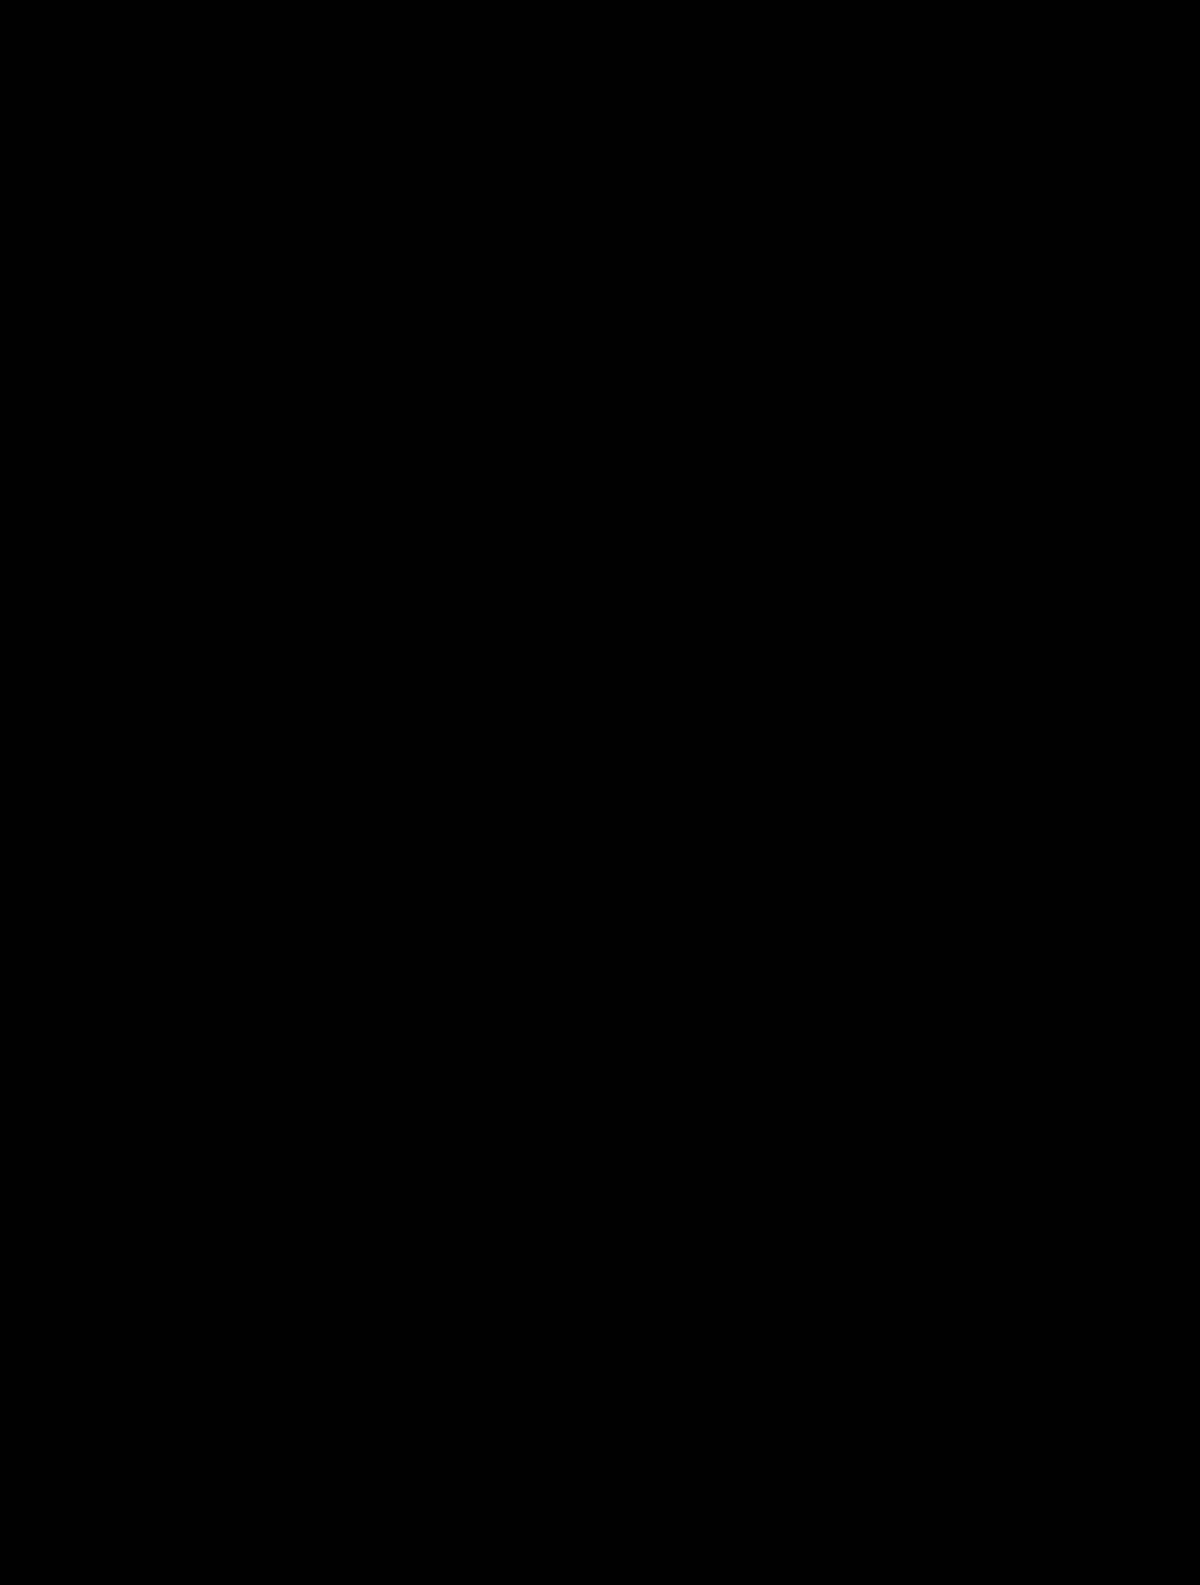 Батик 21151-1 мокасины д/мальчика